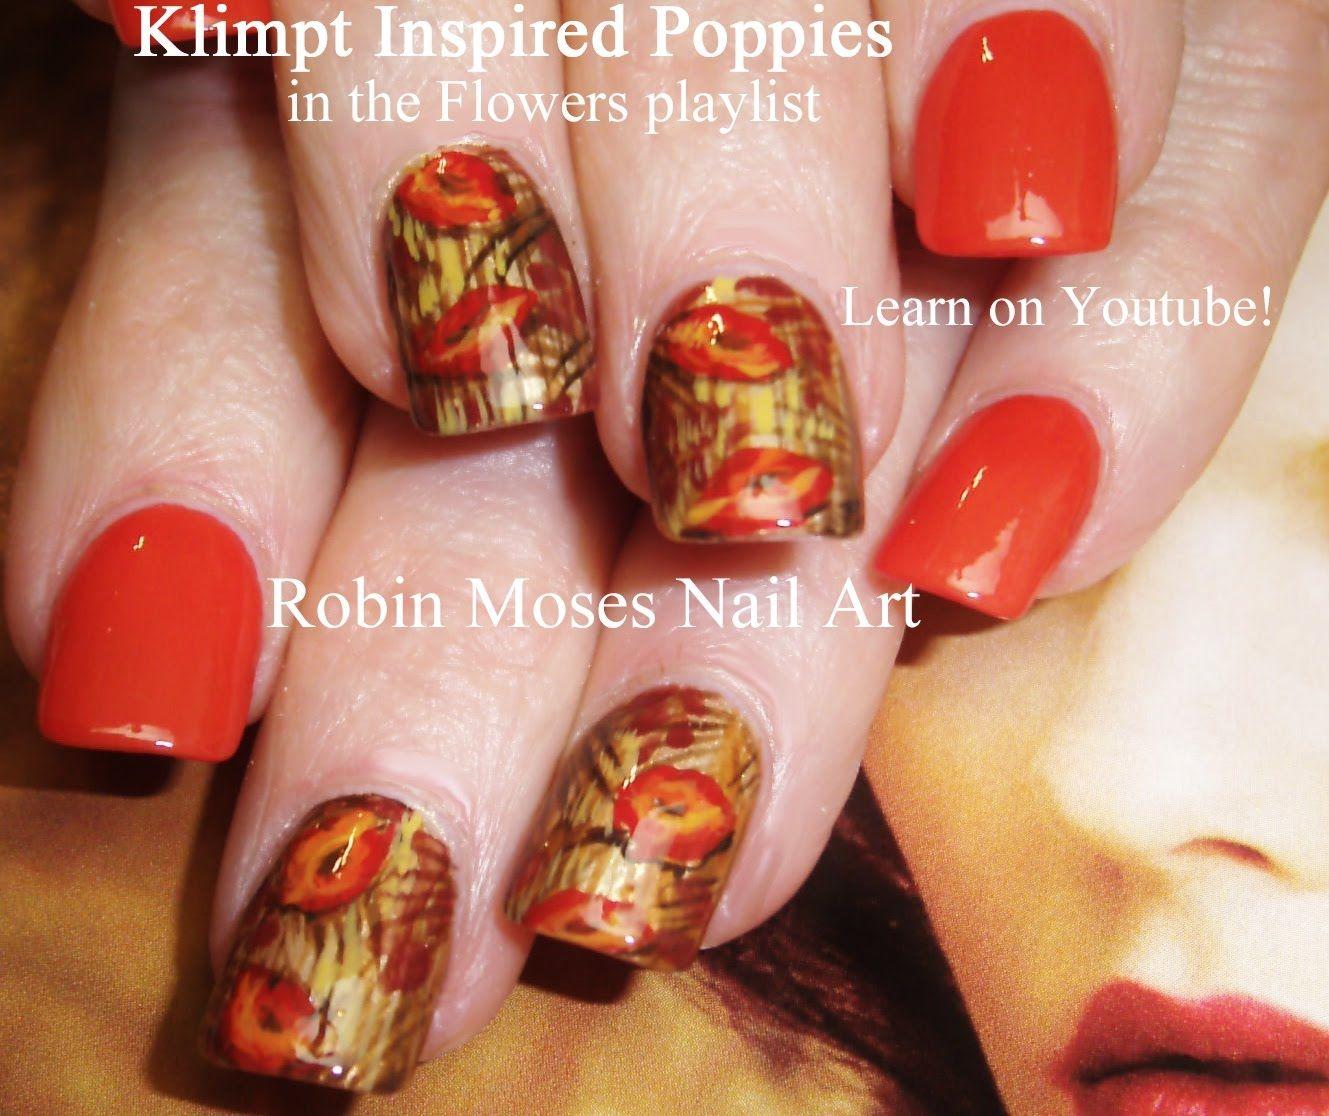 2 Nail Art Tutorials - DIY Easy Orange Accent Poppy Flower Nails ...